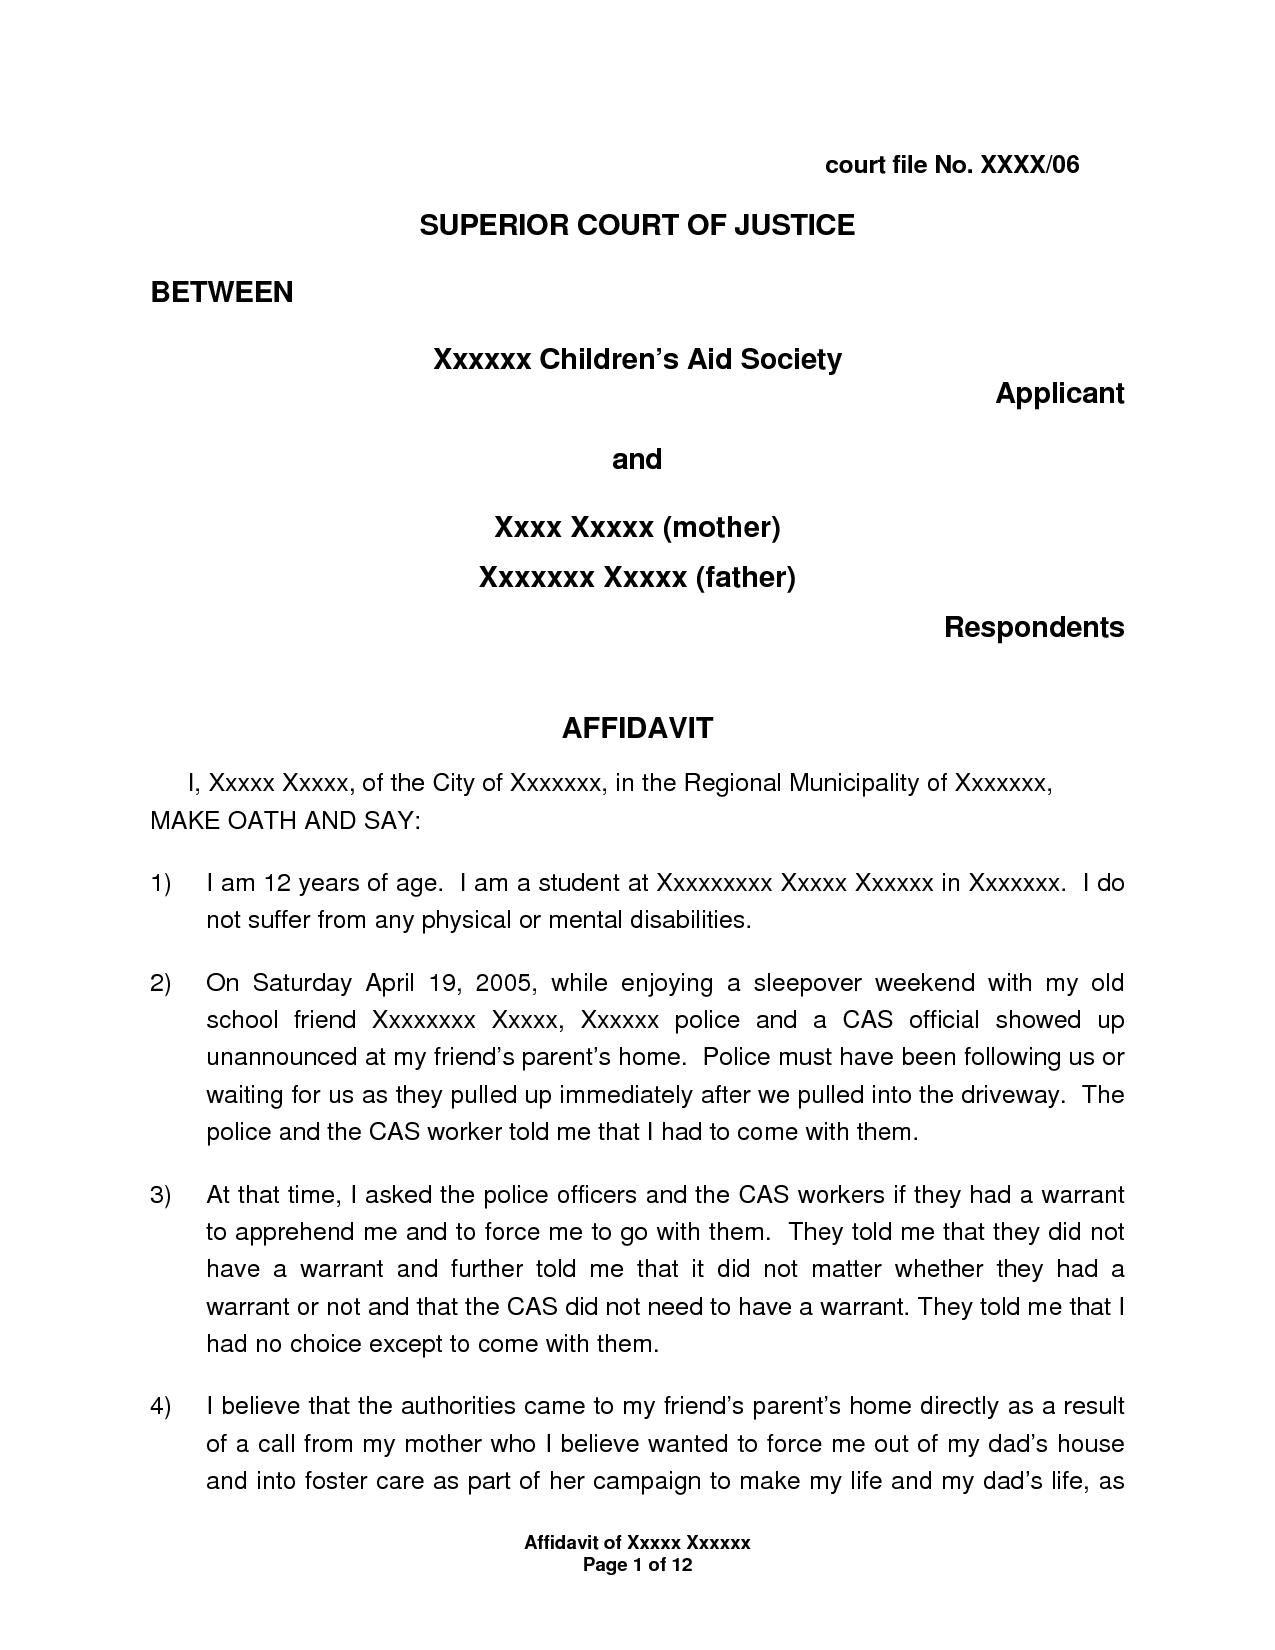 I 751 Affidavit Letter Sample Balolymyku Sworn Affidavit Sample Real State Cover Letter